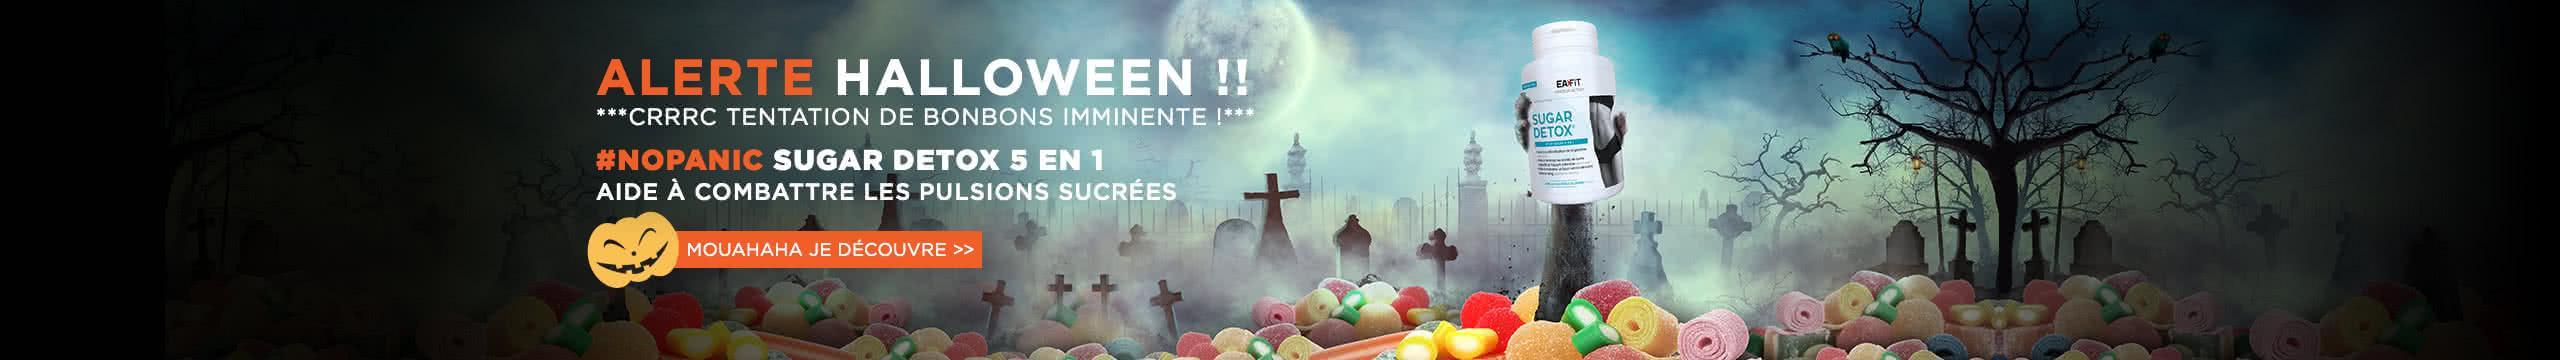 NL-MEA-Sugar-Detox-Halloween